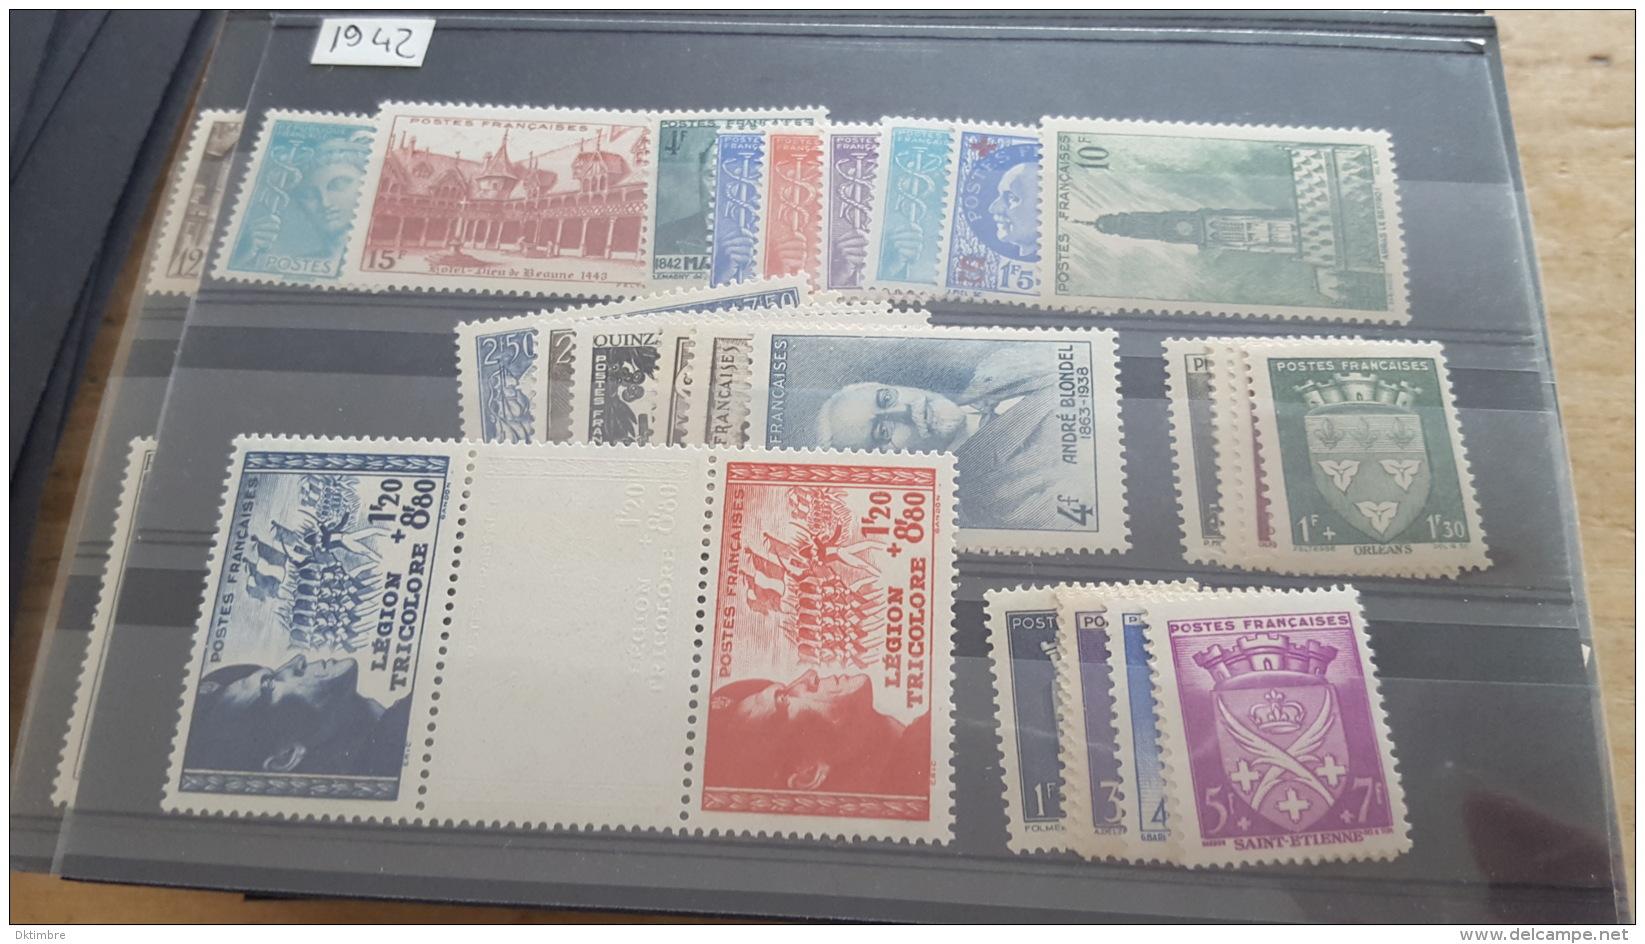 LOT 362803 TIMBRE DE FRANCE NEUF** ANNEE 1942 DEPART A 1€ - France